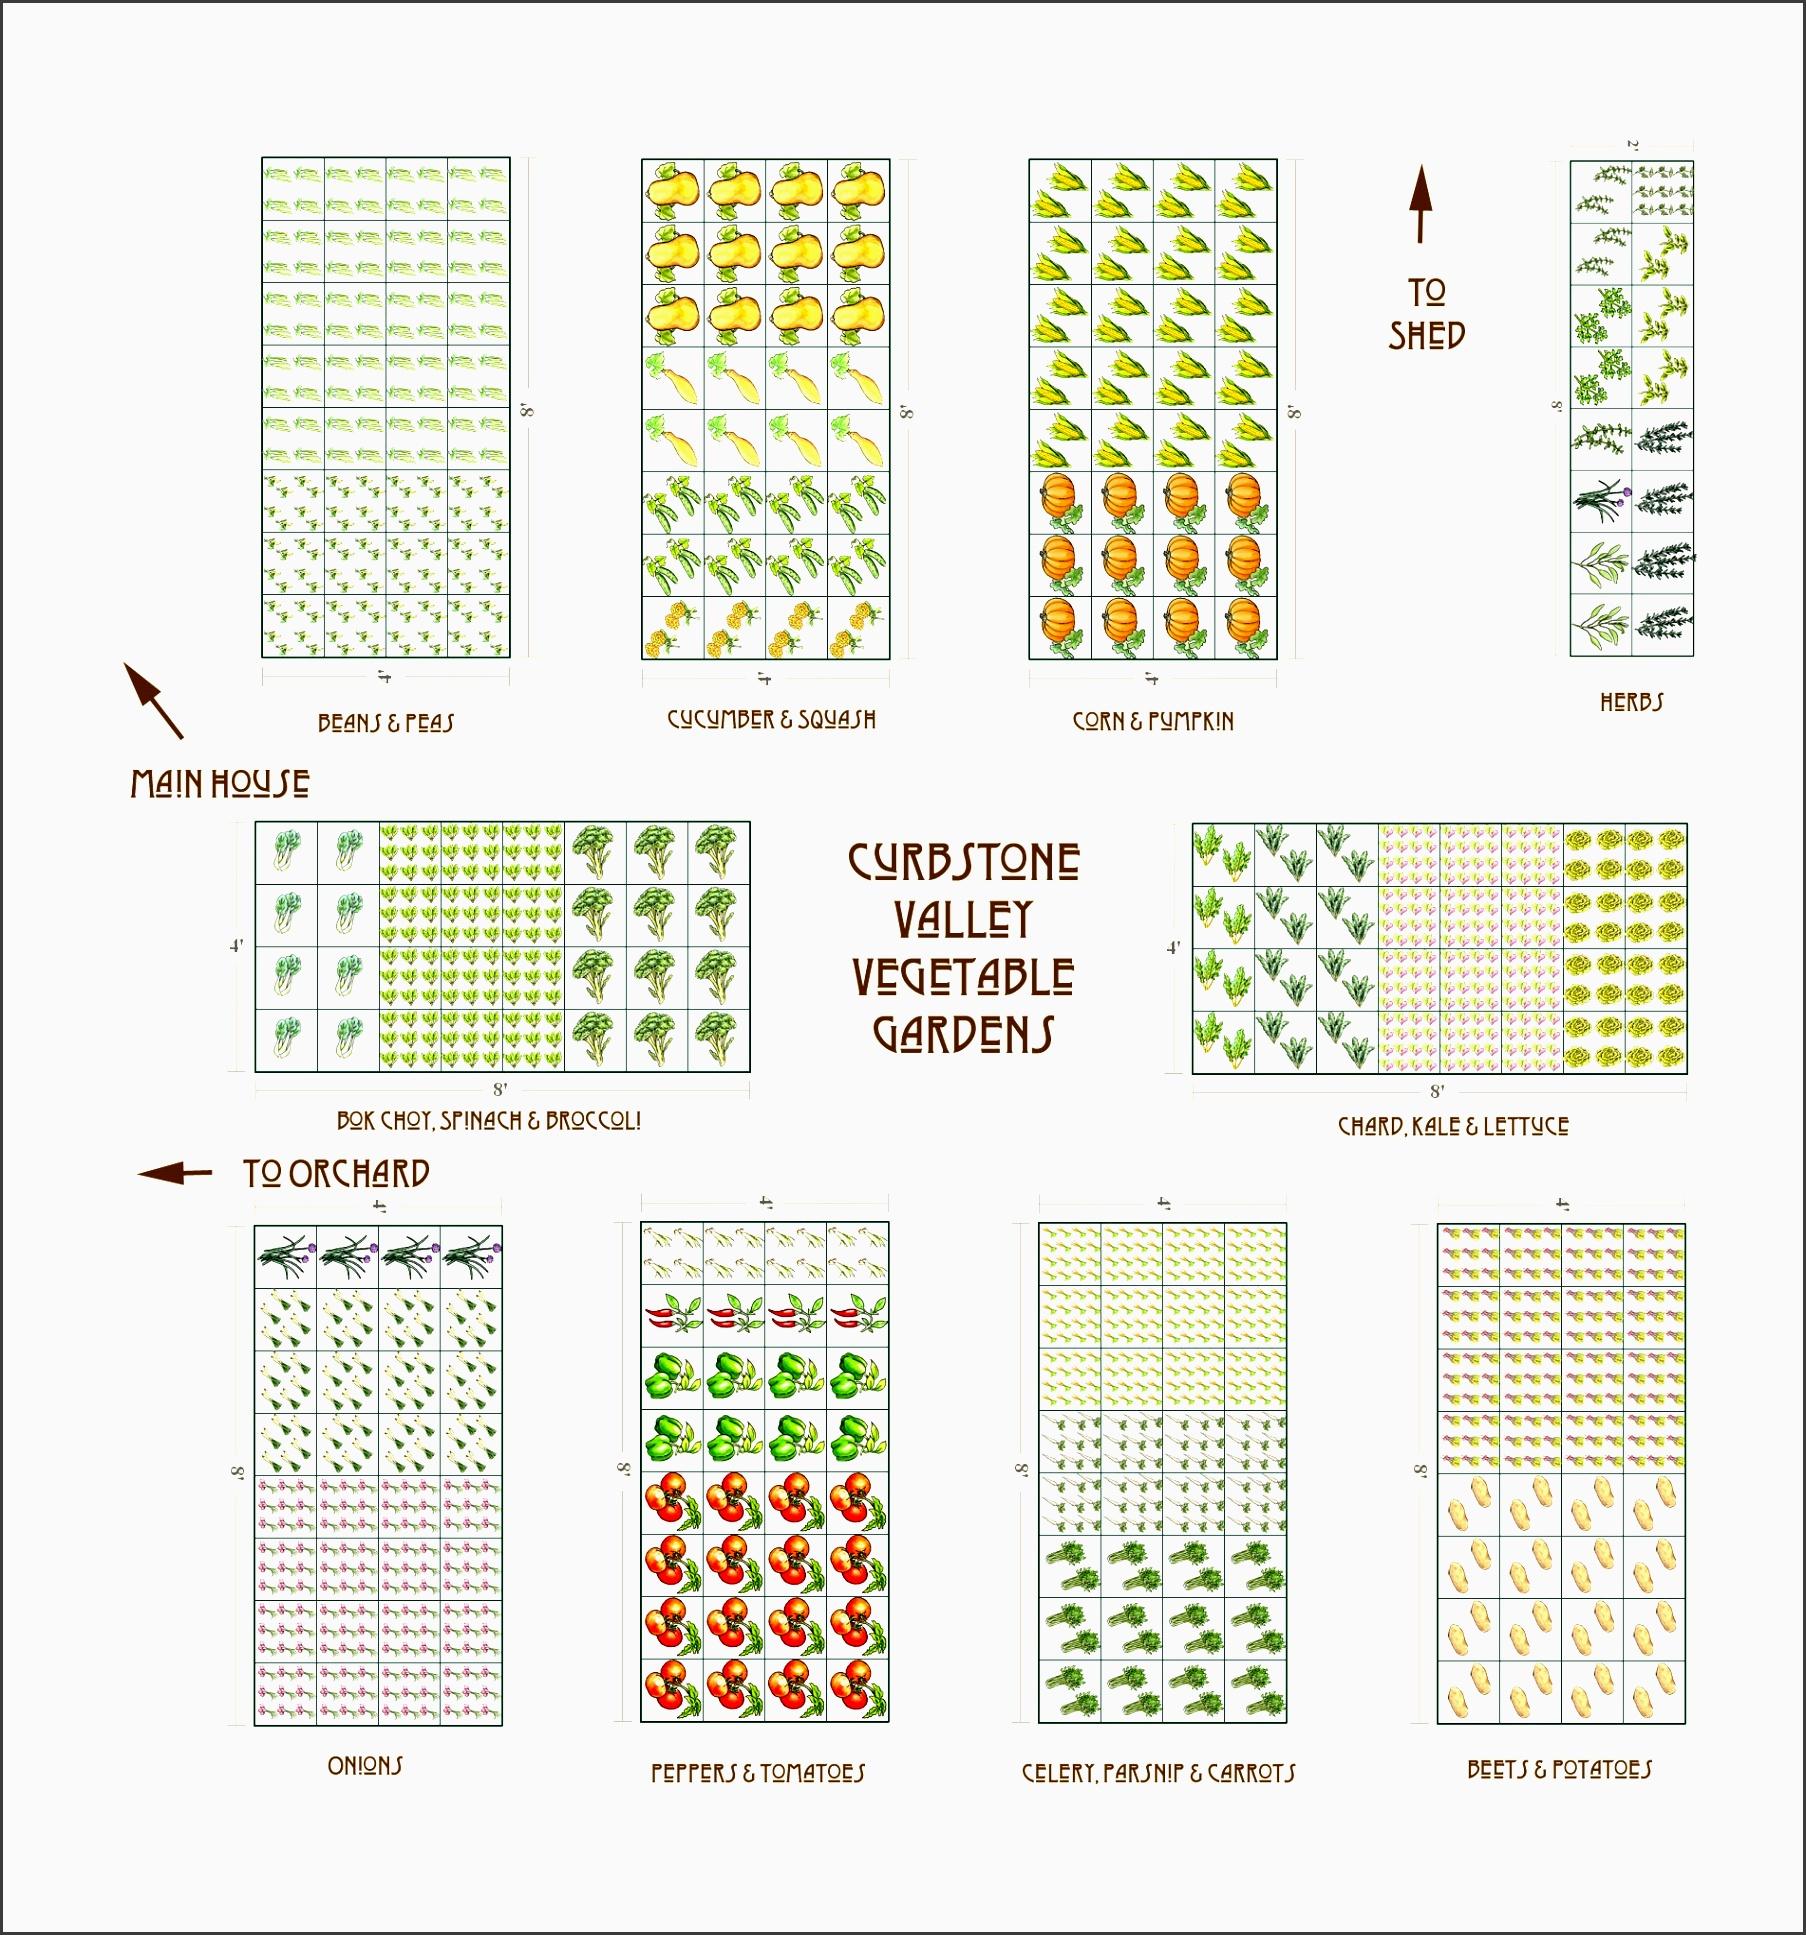 garden planner template ve able free zandalus net brokohan ideas page growing a plans landscape design